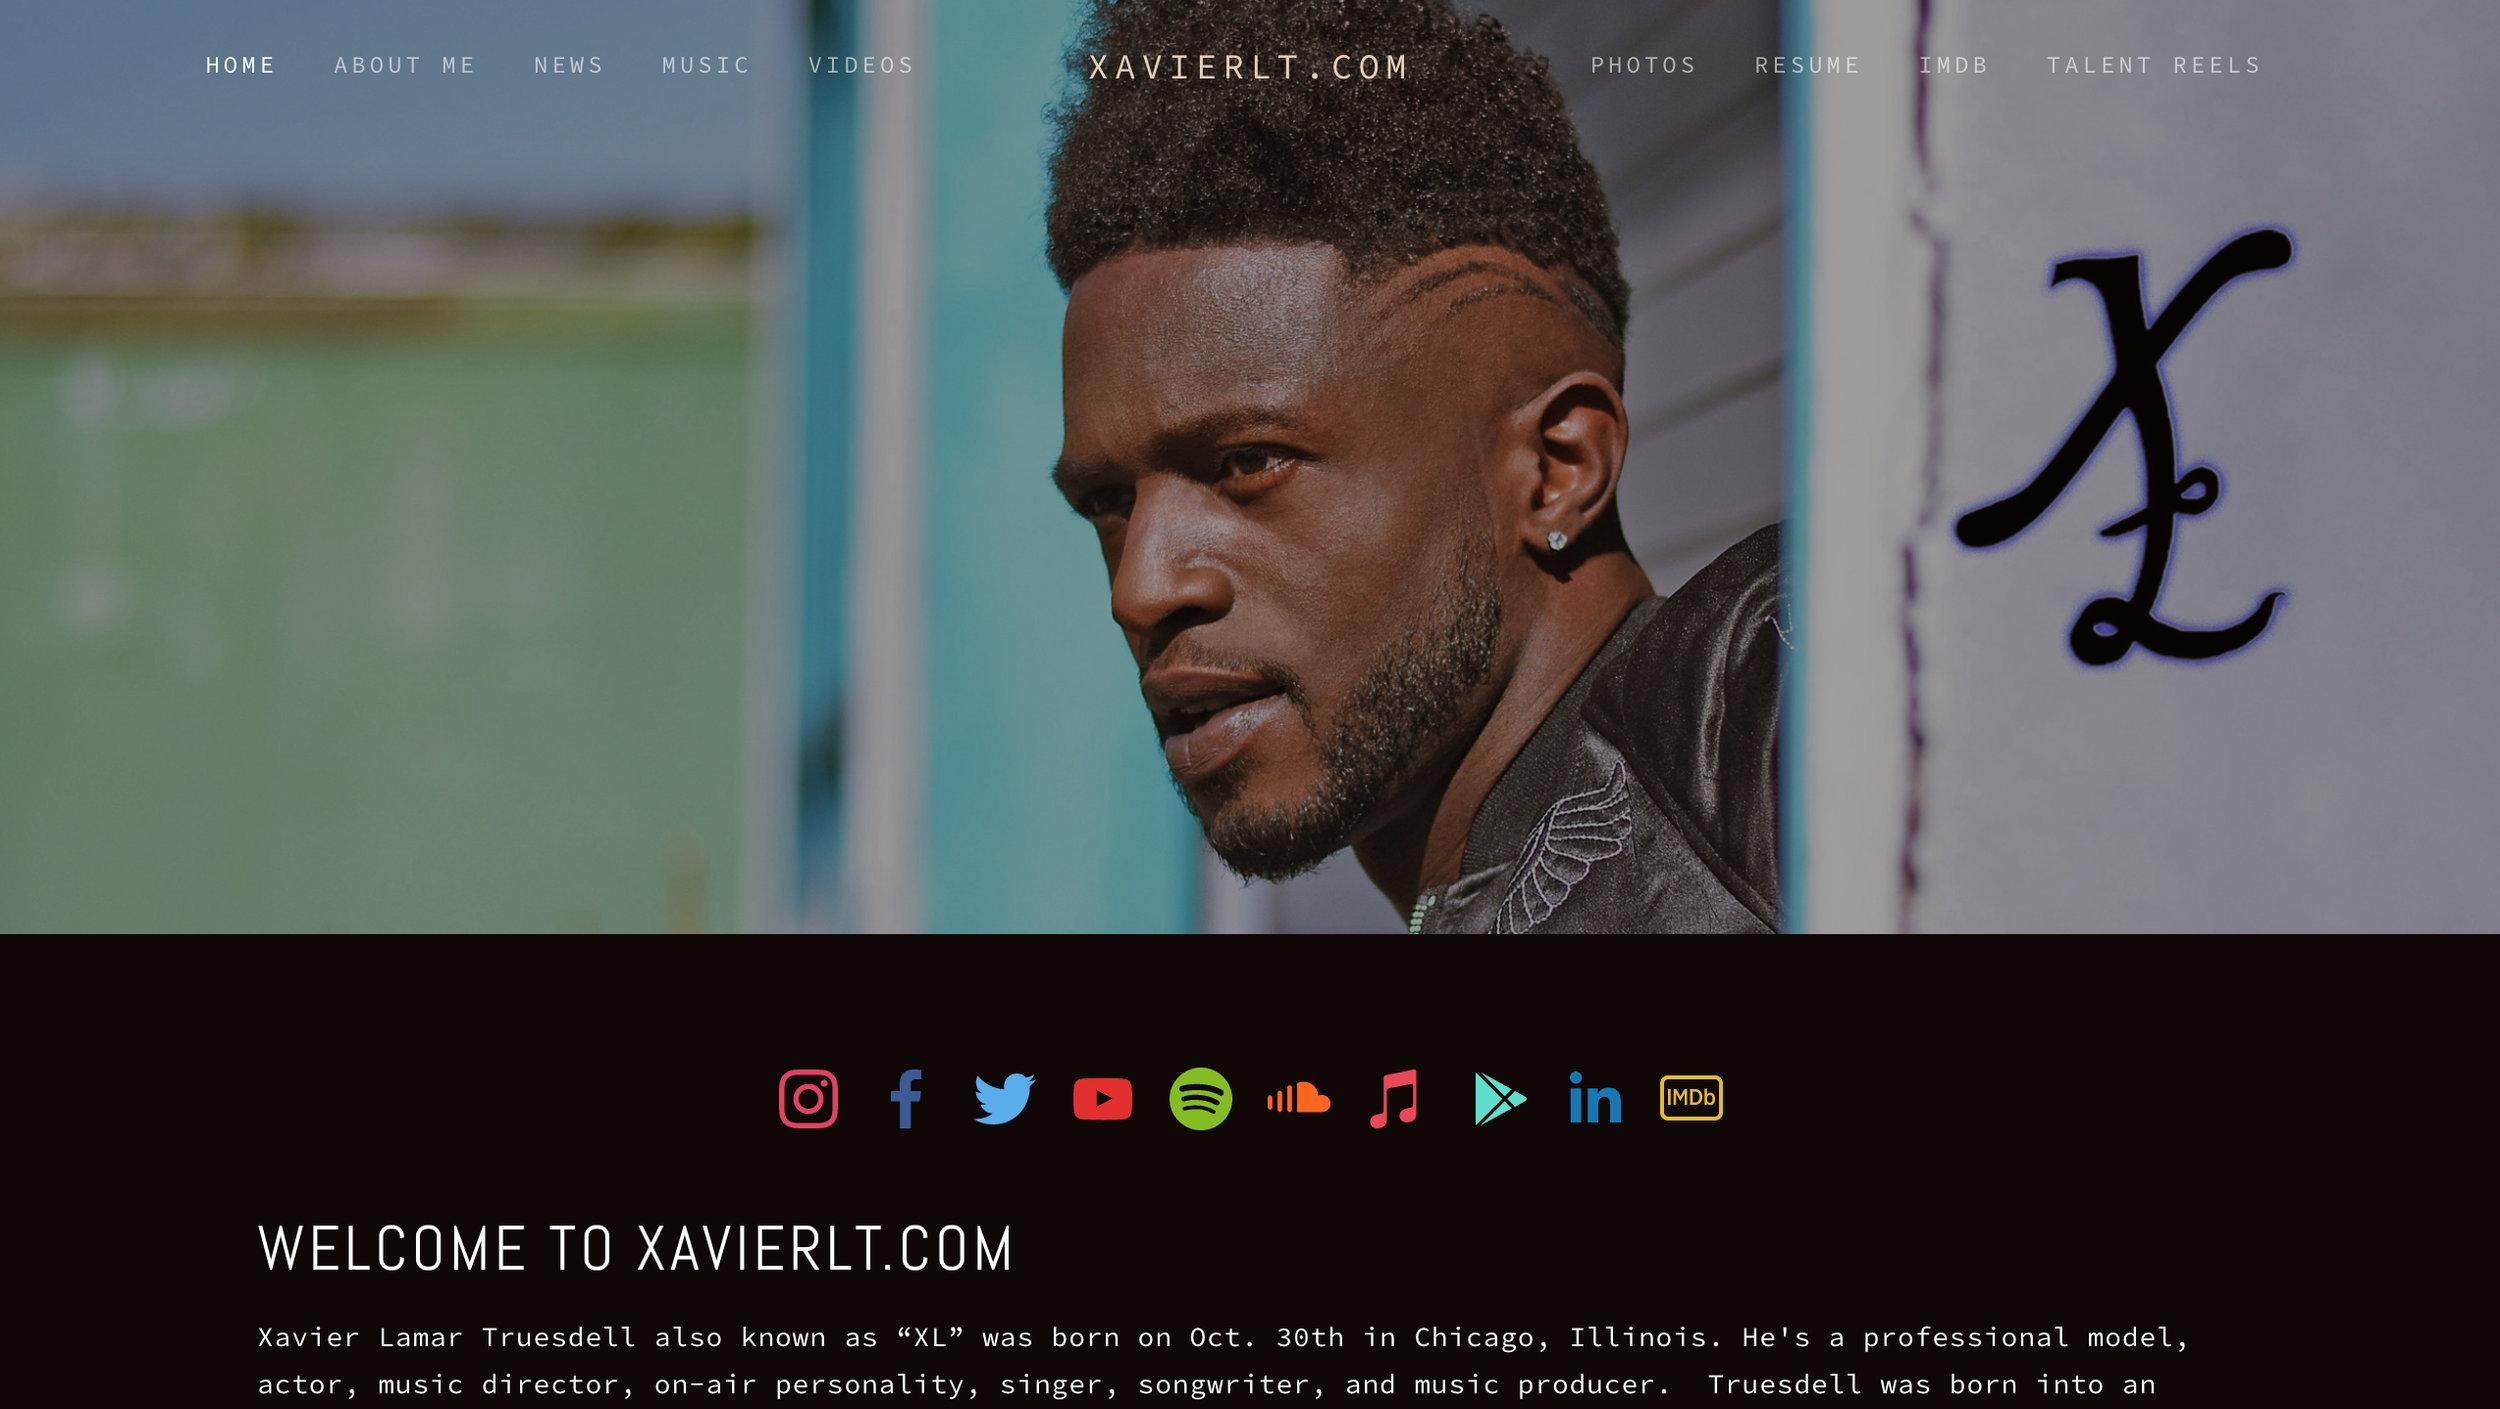 XavierLT.com